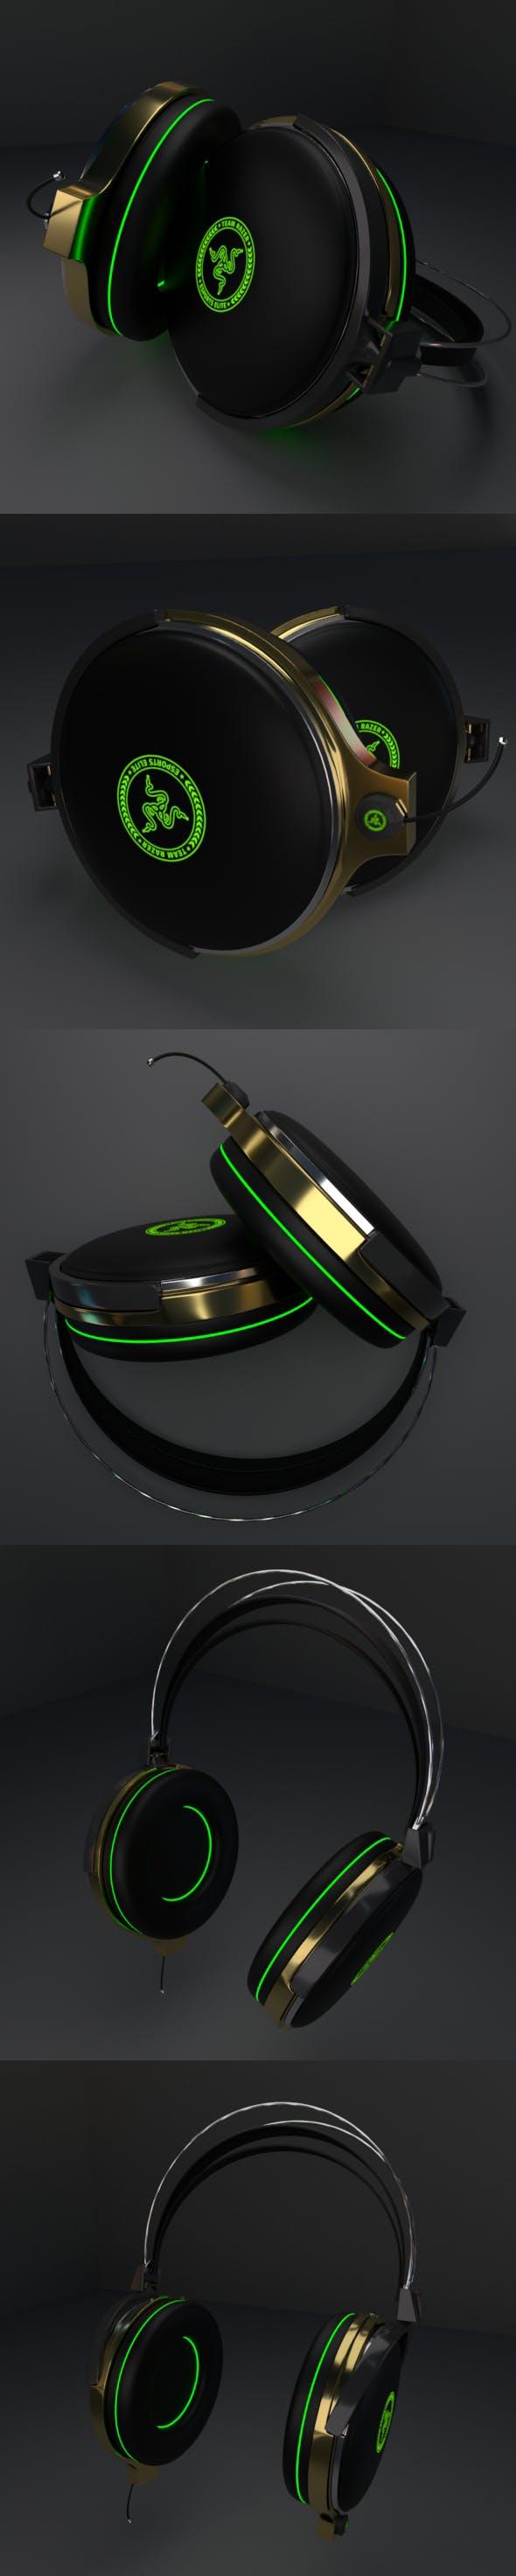 Headphones Razer - 3DOcean Item for Sale